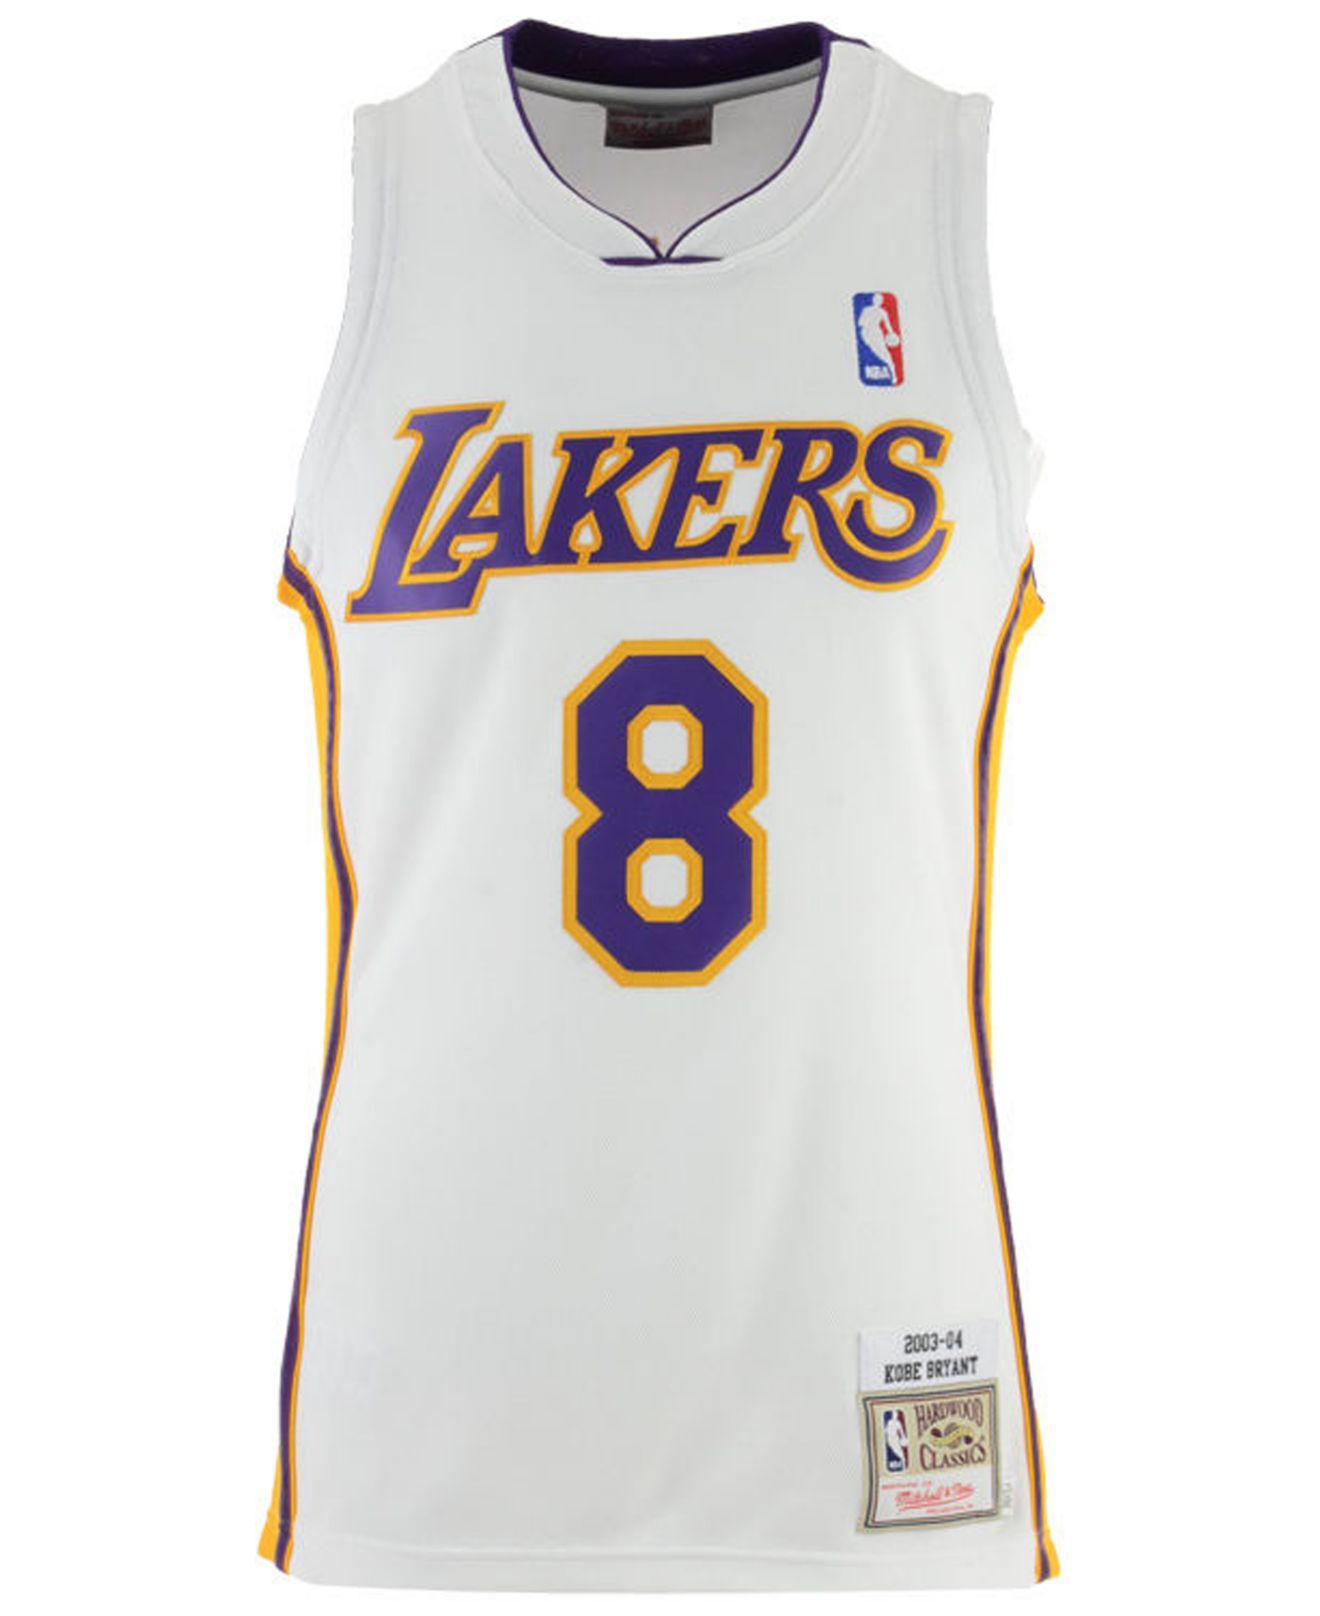 eafa2650cc1 Mitchell   Ness. Men s White Kobe Bryant Los Angeles Lakers Authentic Jersey